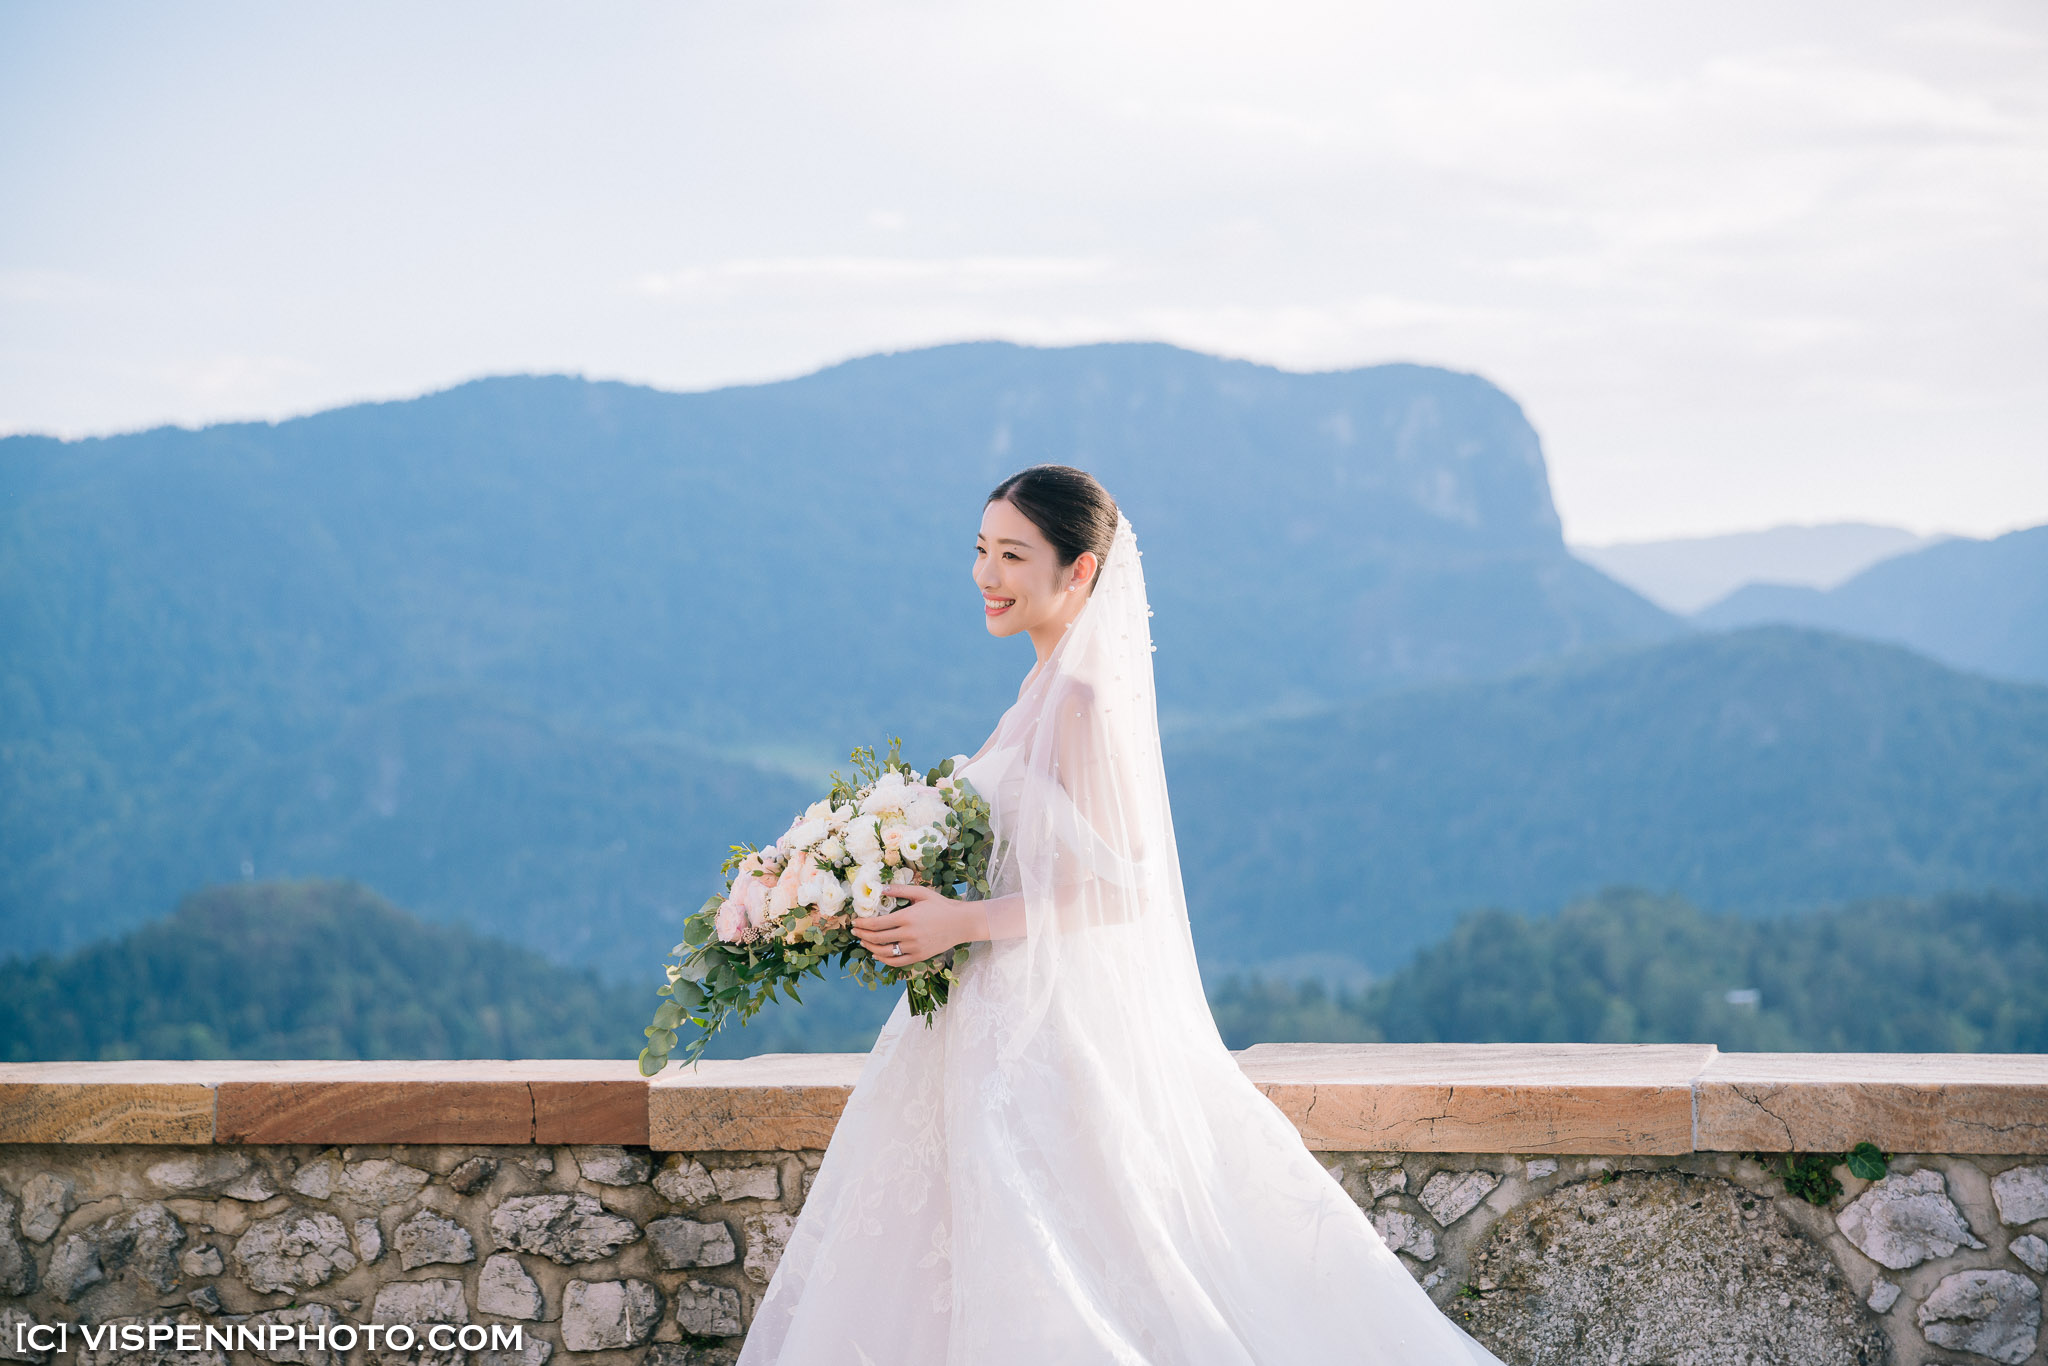 PRE WEDDING Photography Melbourne VISPENN 墨尔本 婚纱照 结婚照 婚纱摄影 DSC04022